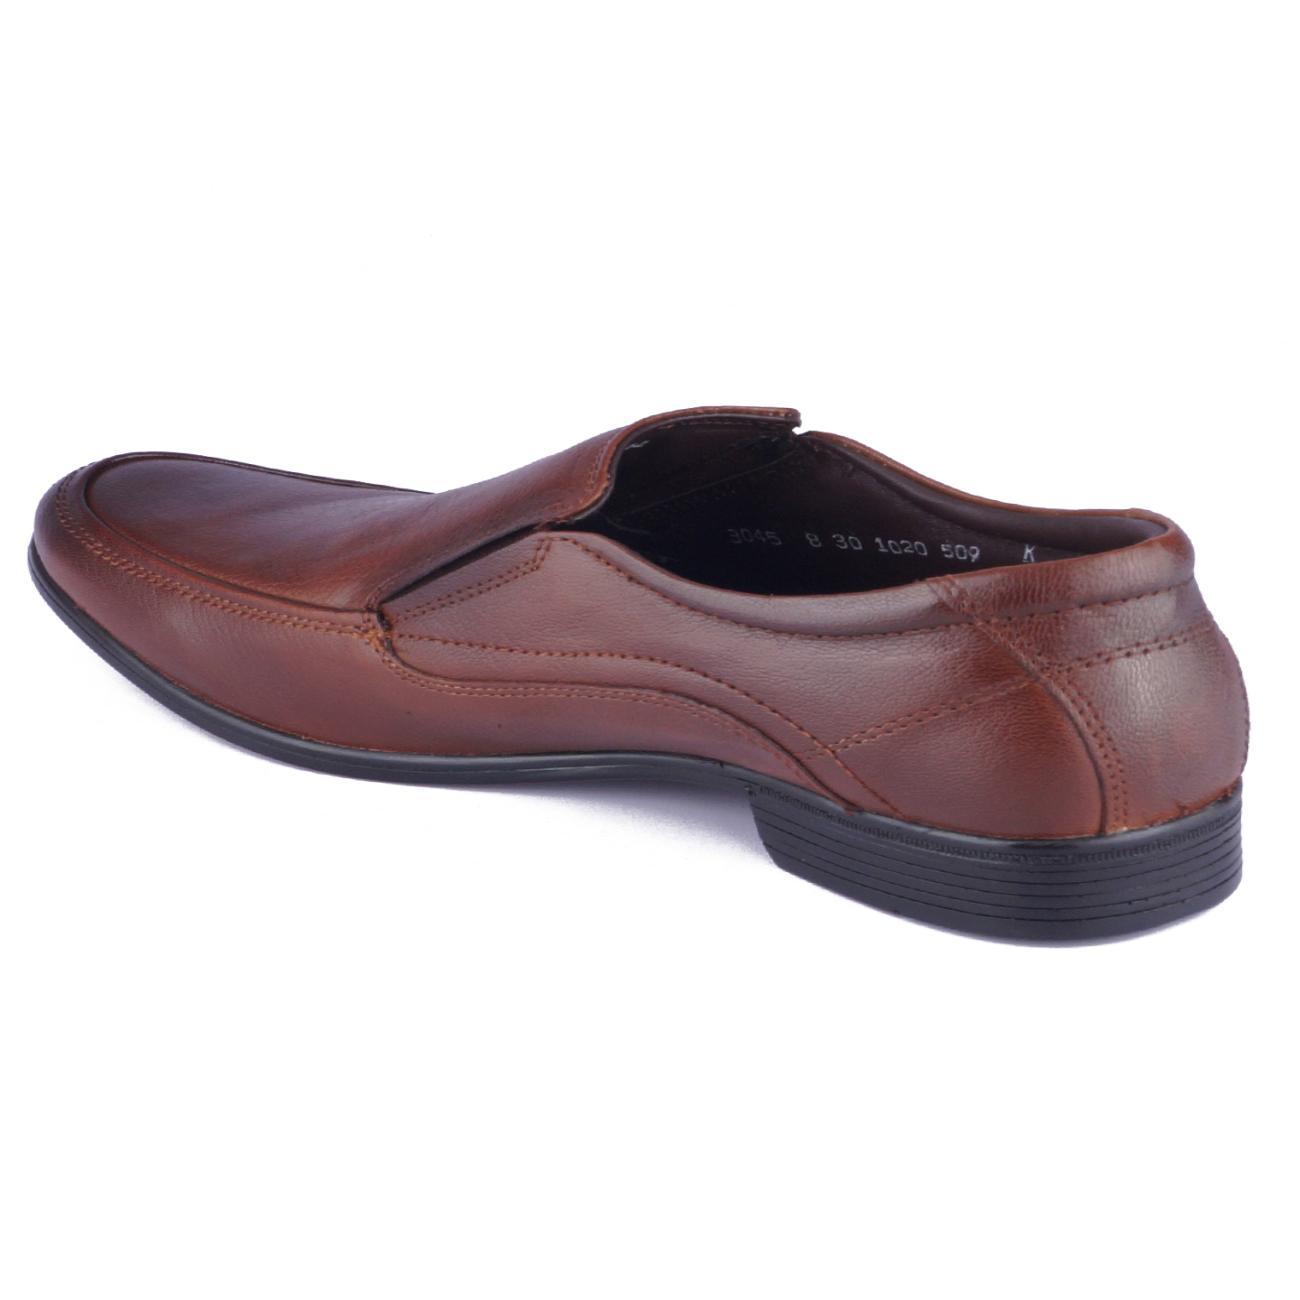 tan original leather slip-on formal shoes